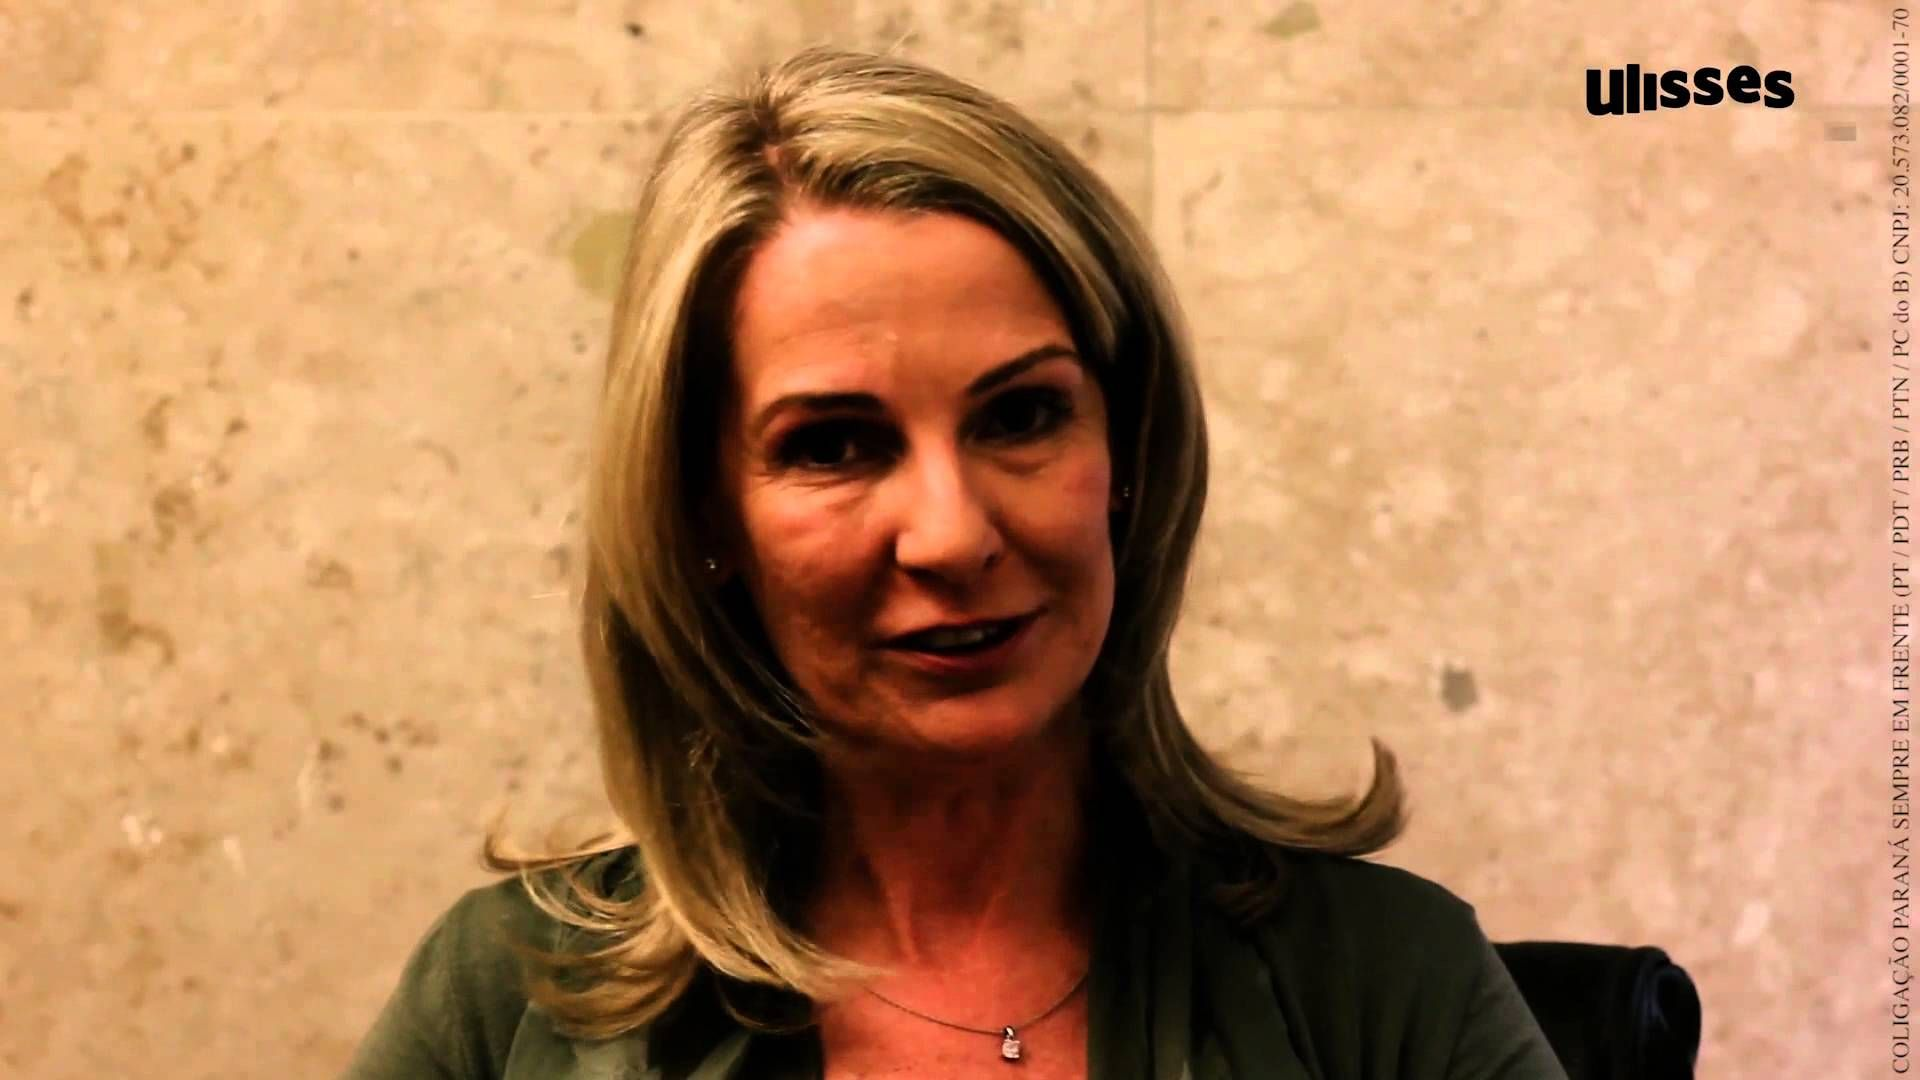 Vice-Prefeita Mirian Gonçalves apoia o candidato a Deputado Federal Ulisses Kaniak 1357. #ulisses1357 #ulisseskaniak #ulisseskaniak1357 #politicaecoisaseria